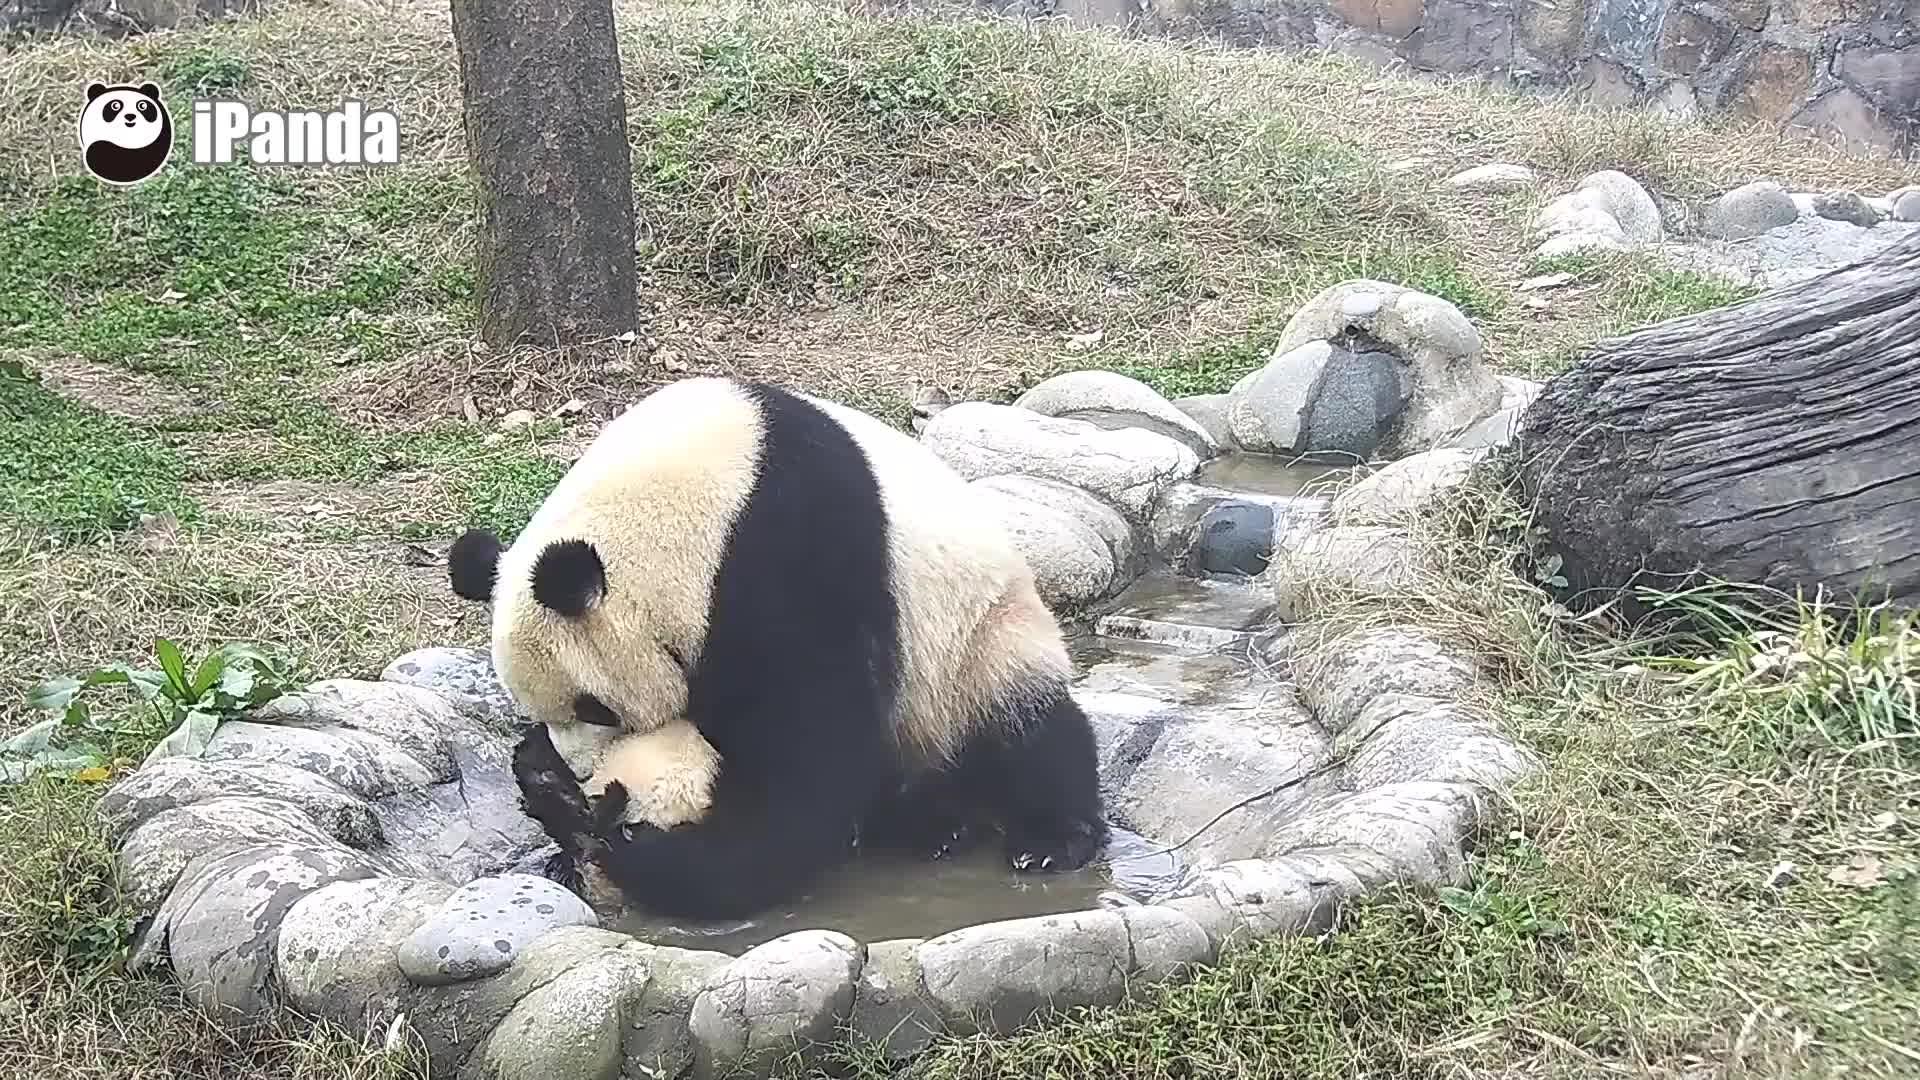 likeus, 熊猫团团, 熊猫宝宝, Adorable Panda Baby's bath GIFs